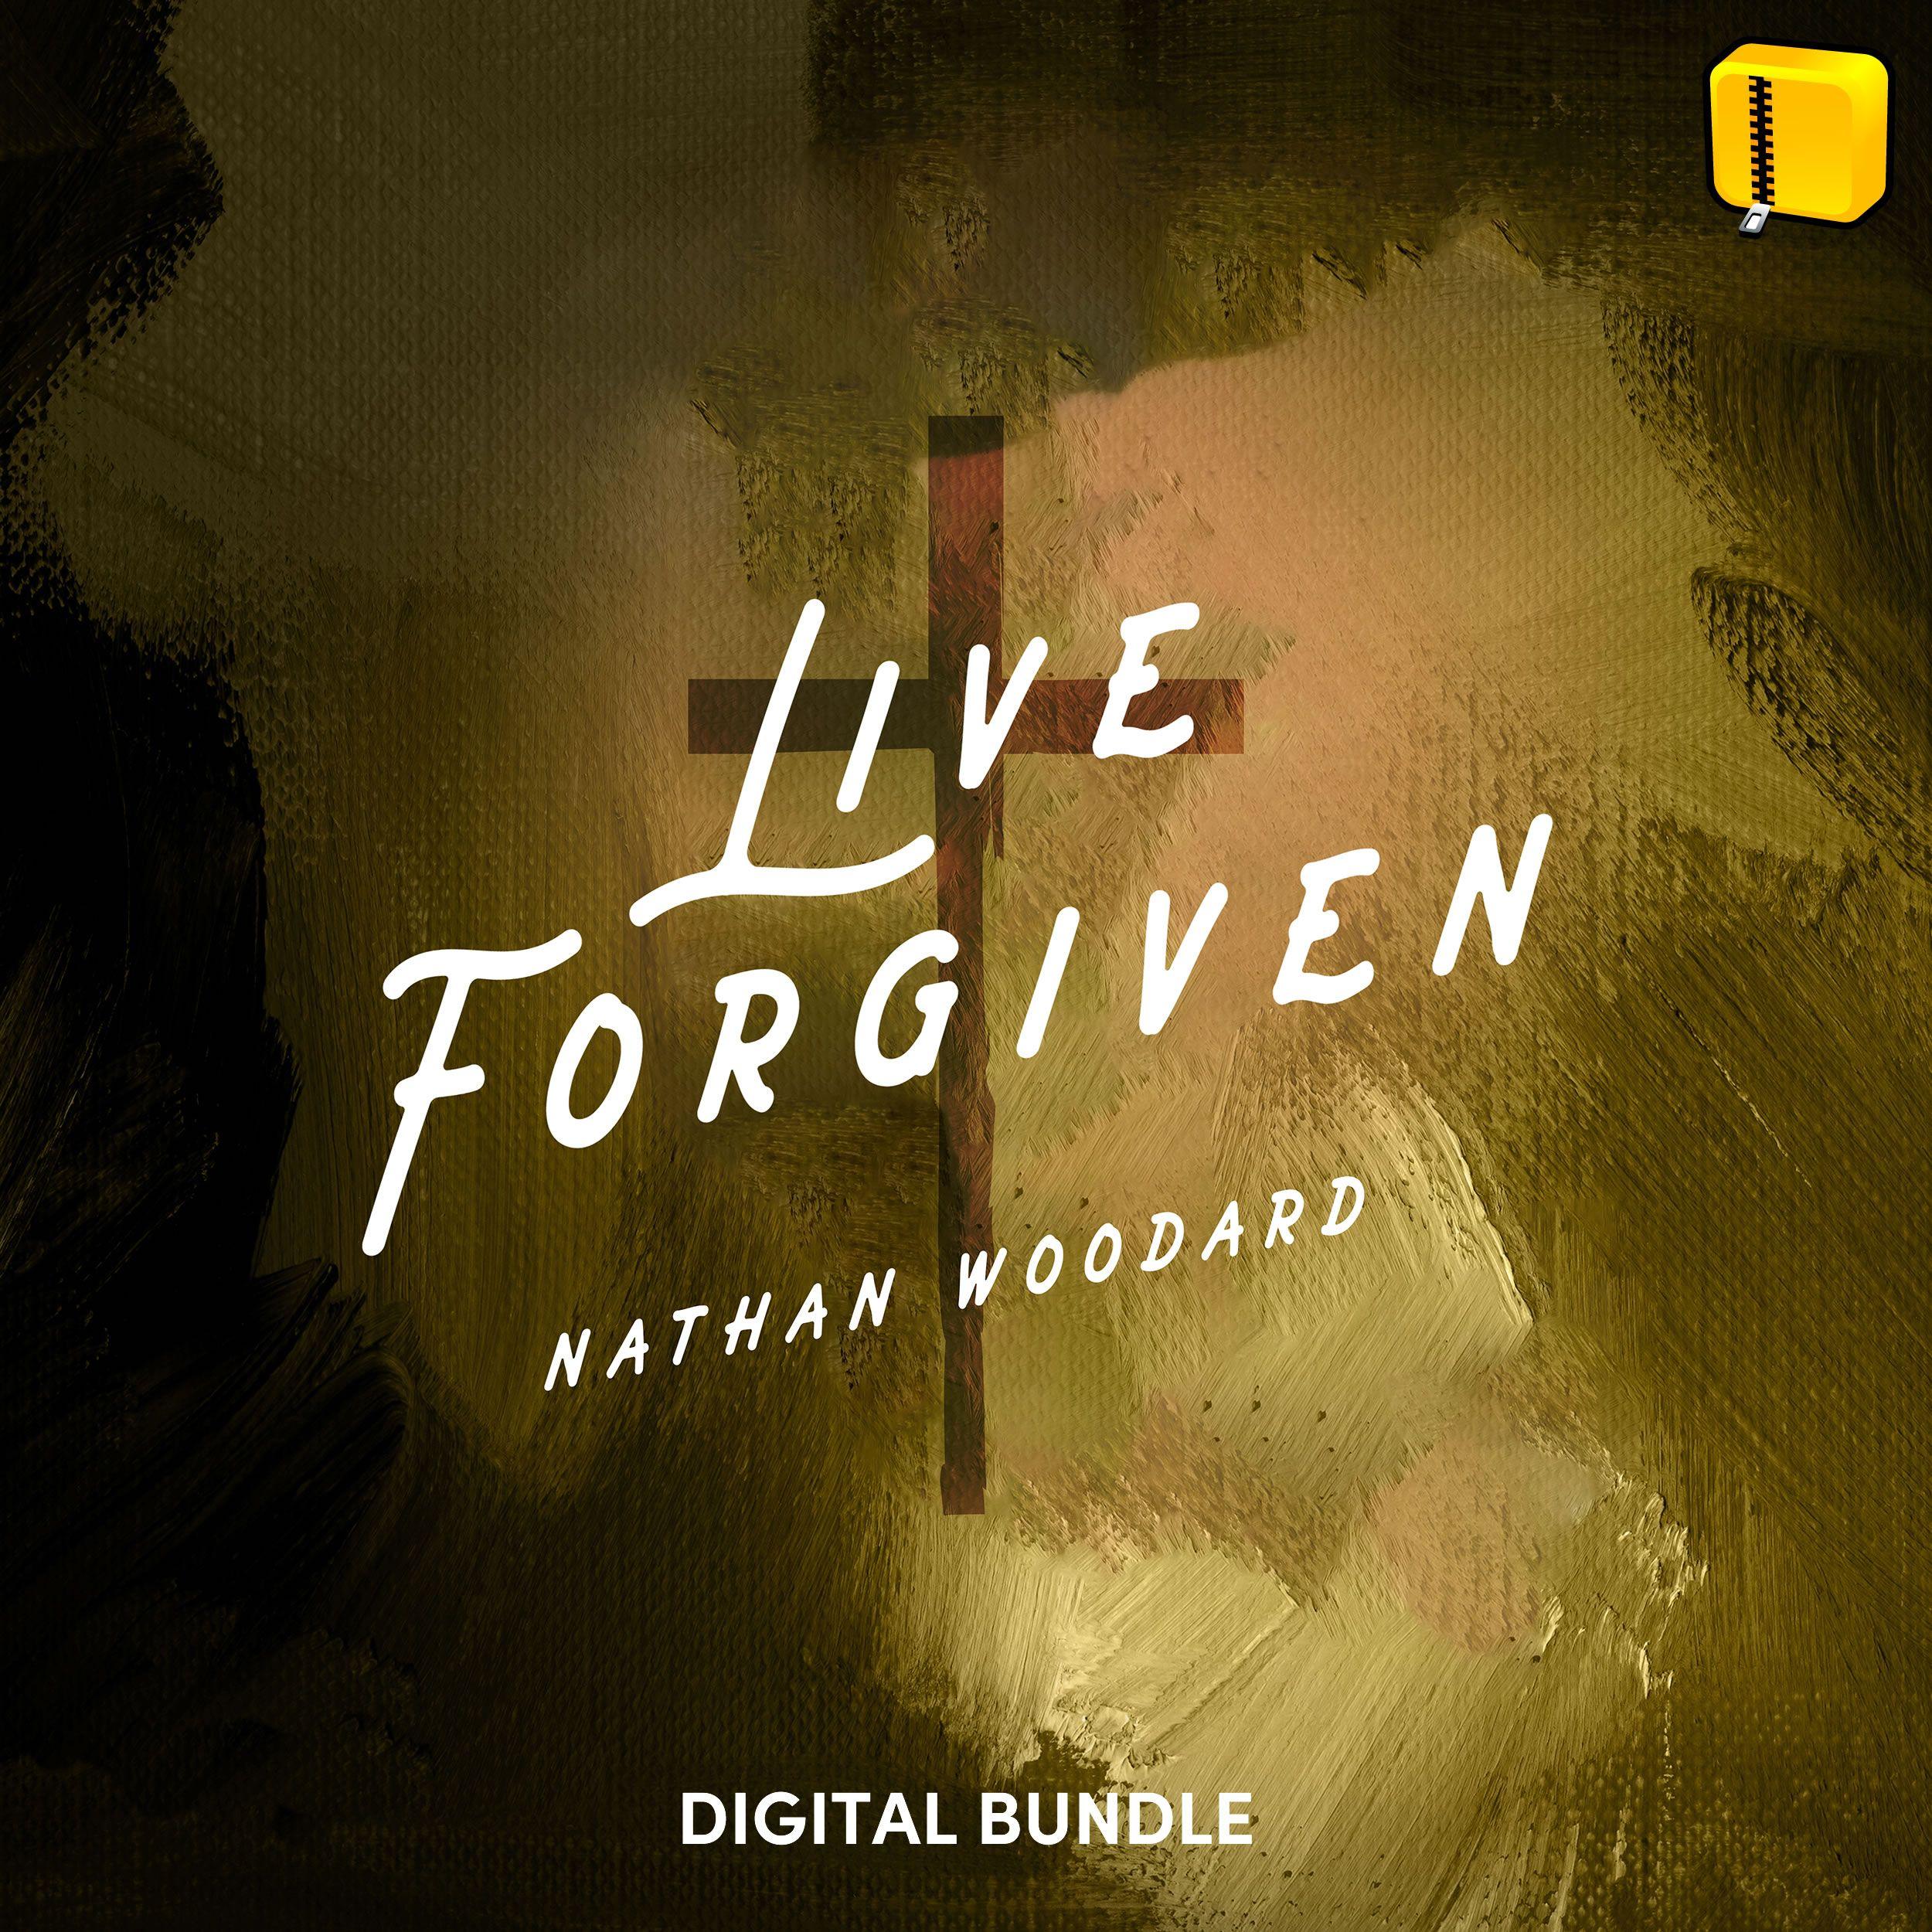 Live Forgiven